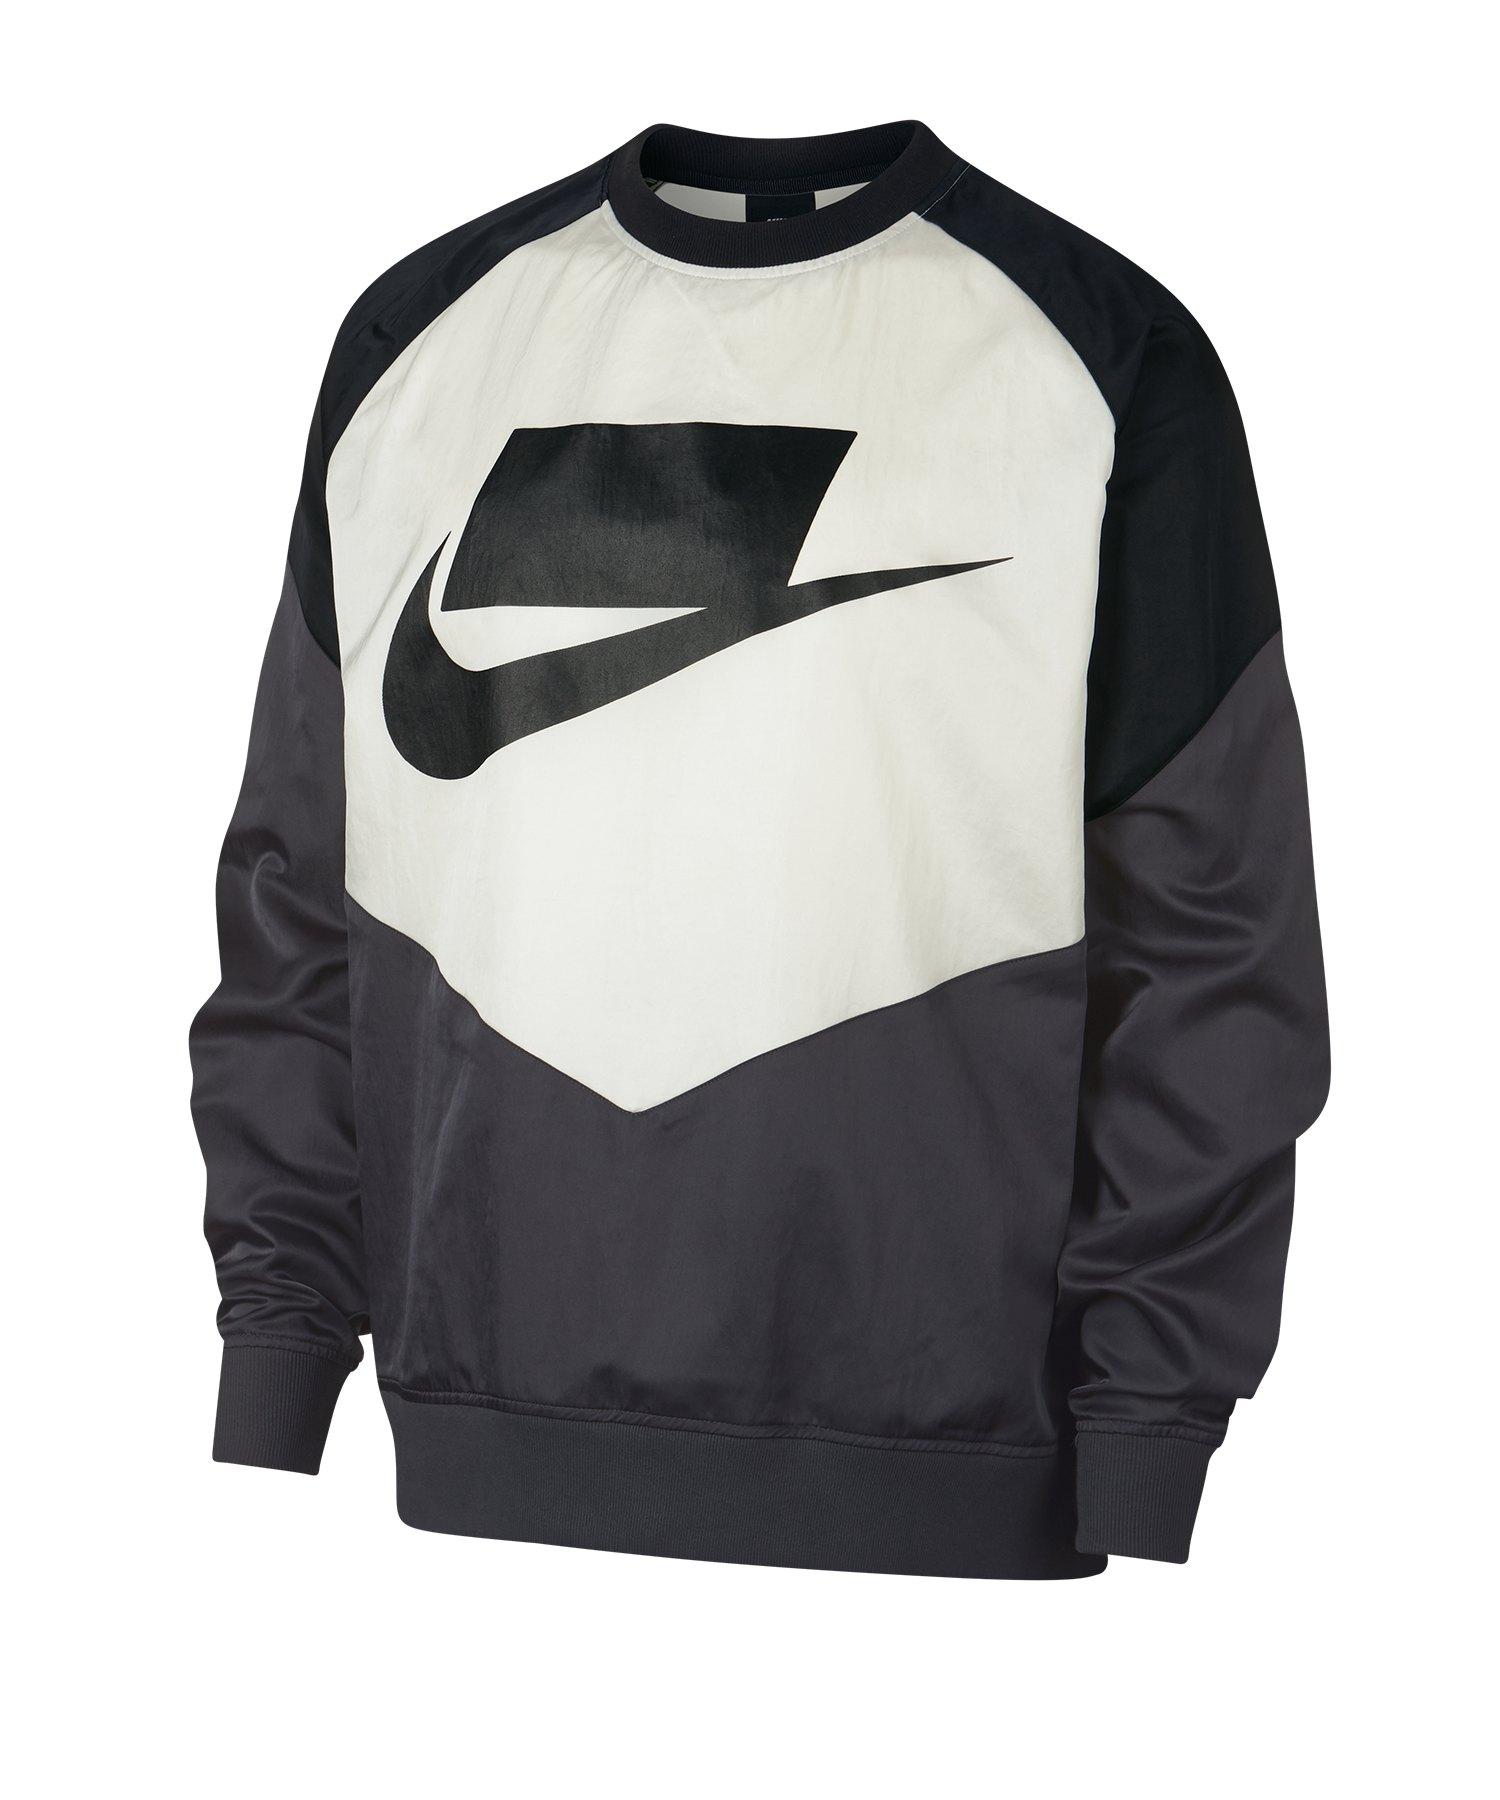 Nike Crew Woven Sweatshirt Schwarz Grau F060 - Grau